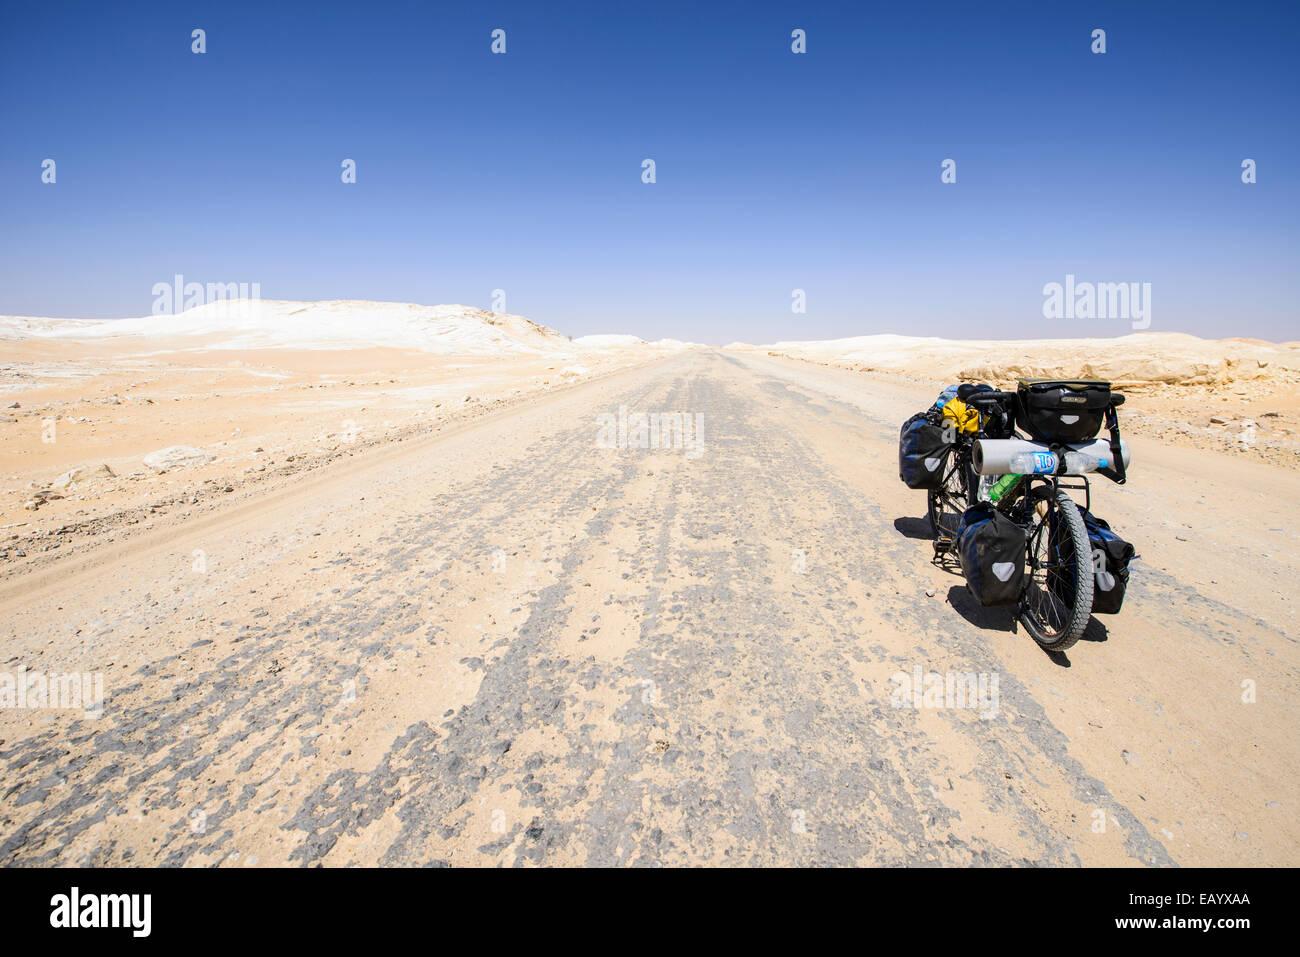 Cycling in the Sahara White desert, Egypt - Stock Image